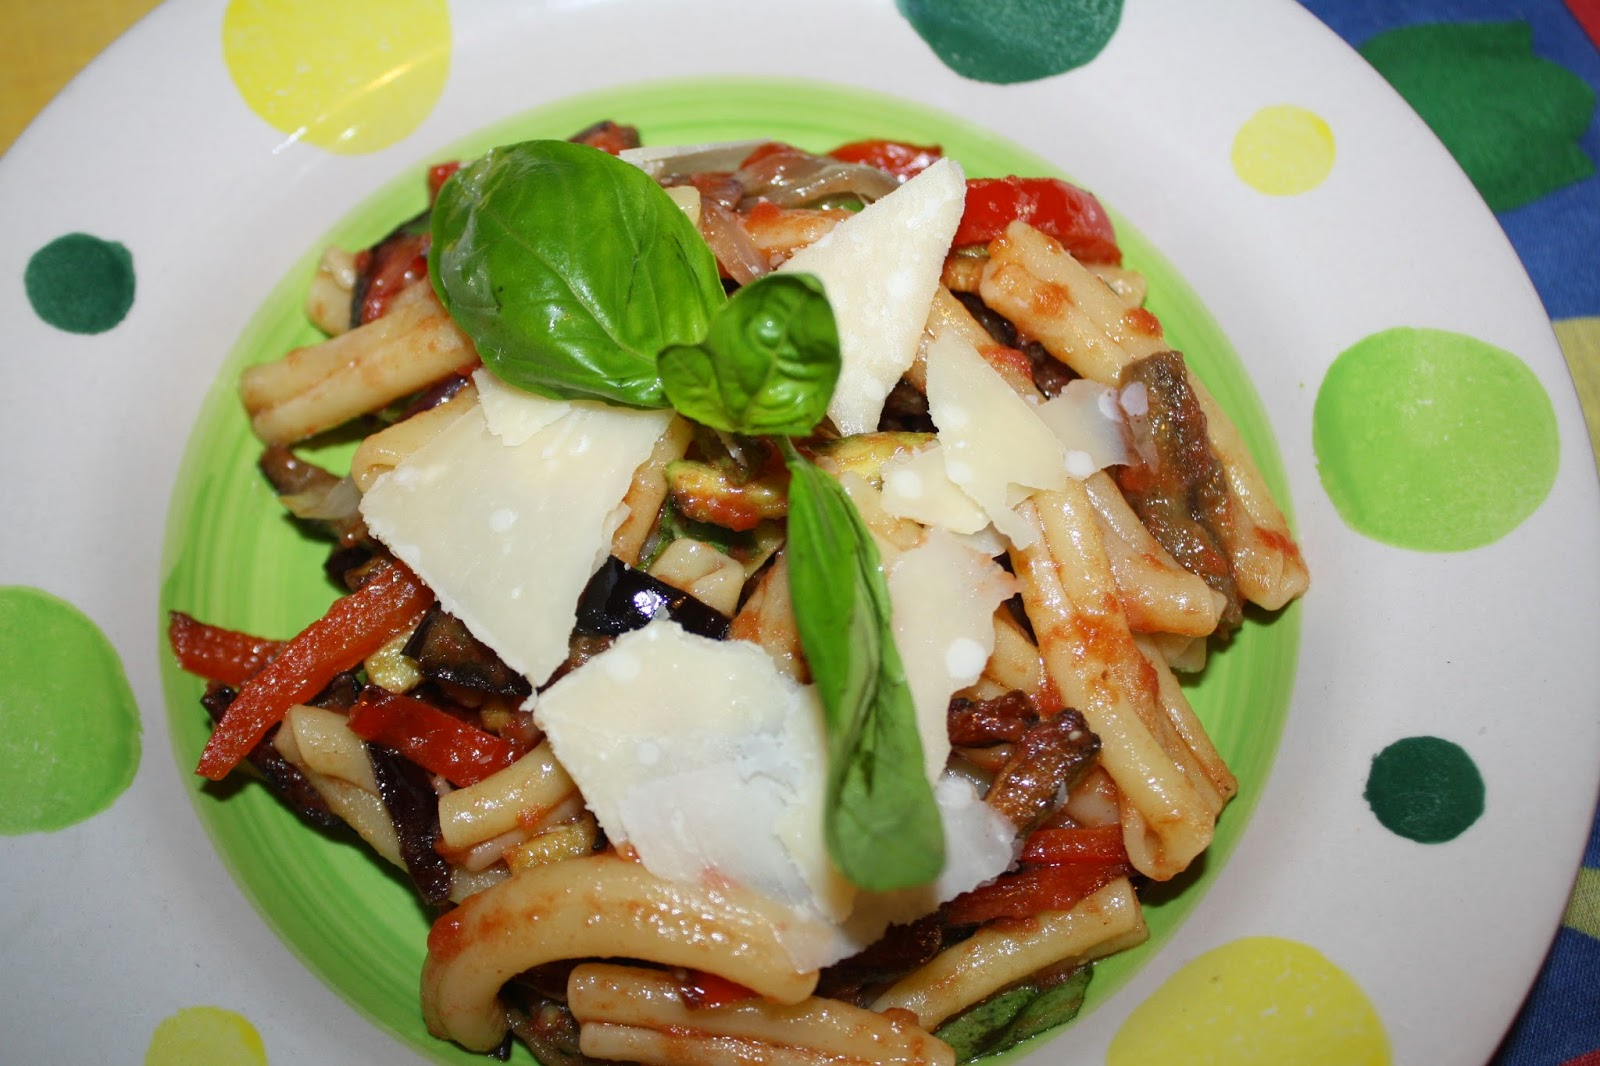 pasta con le verdure